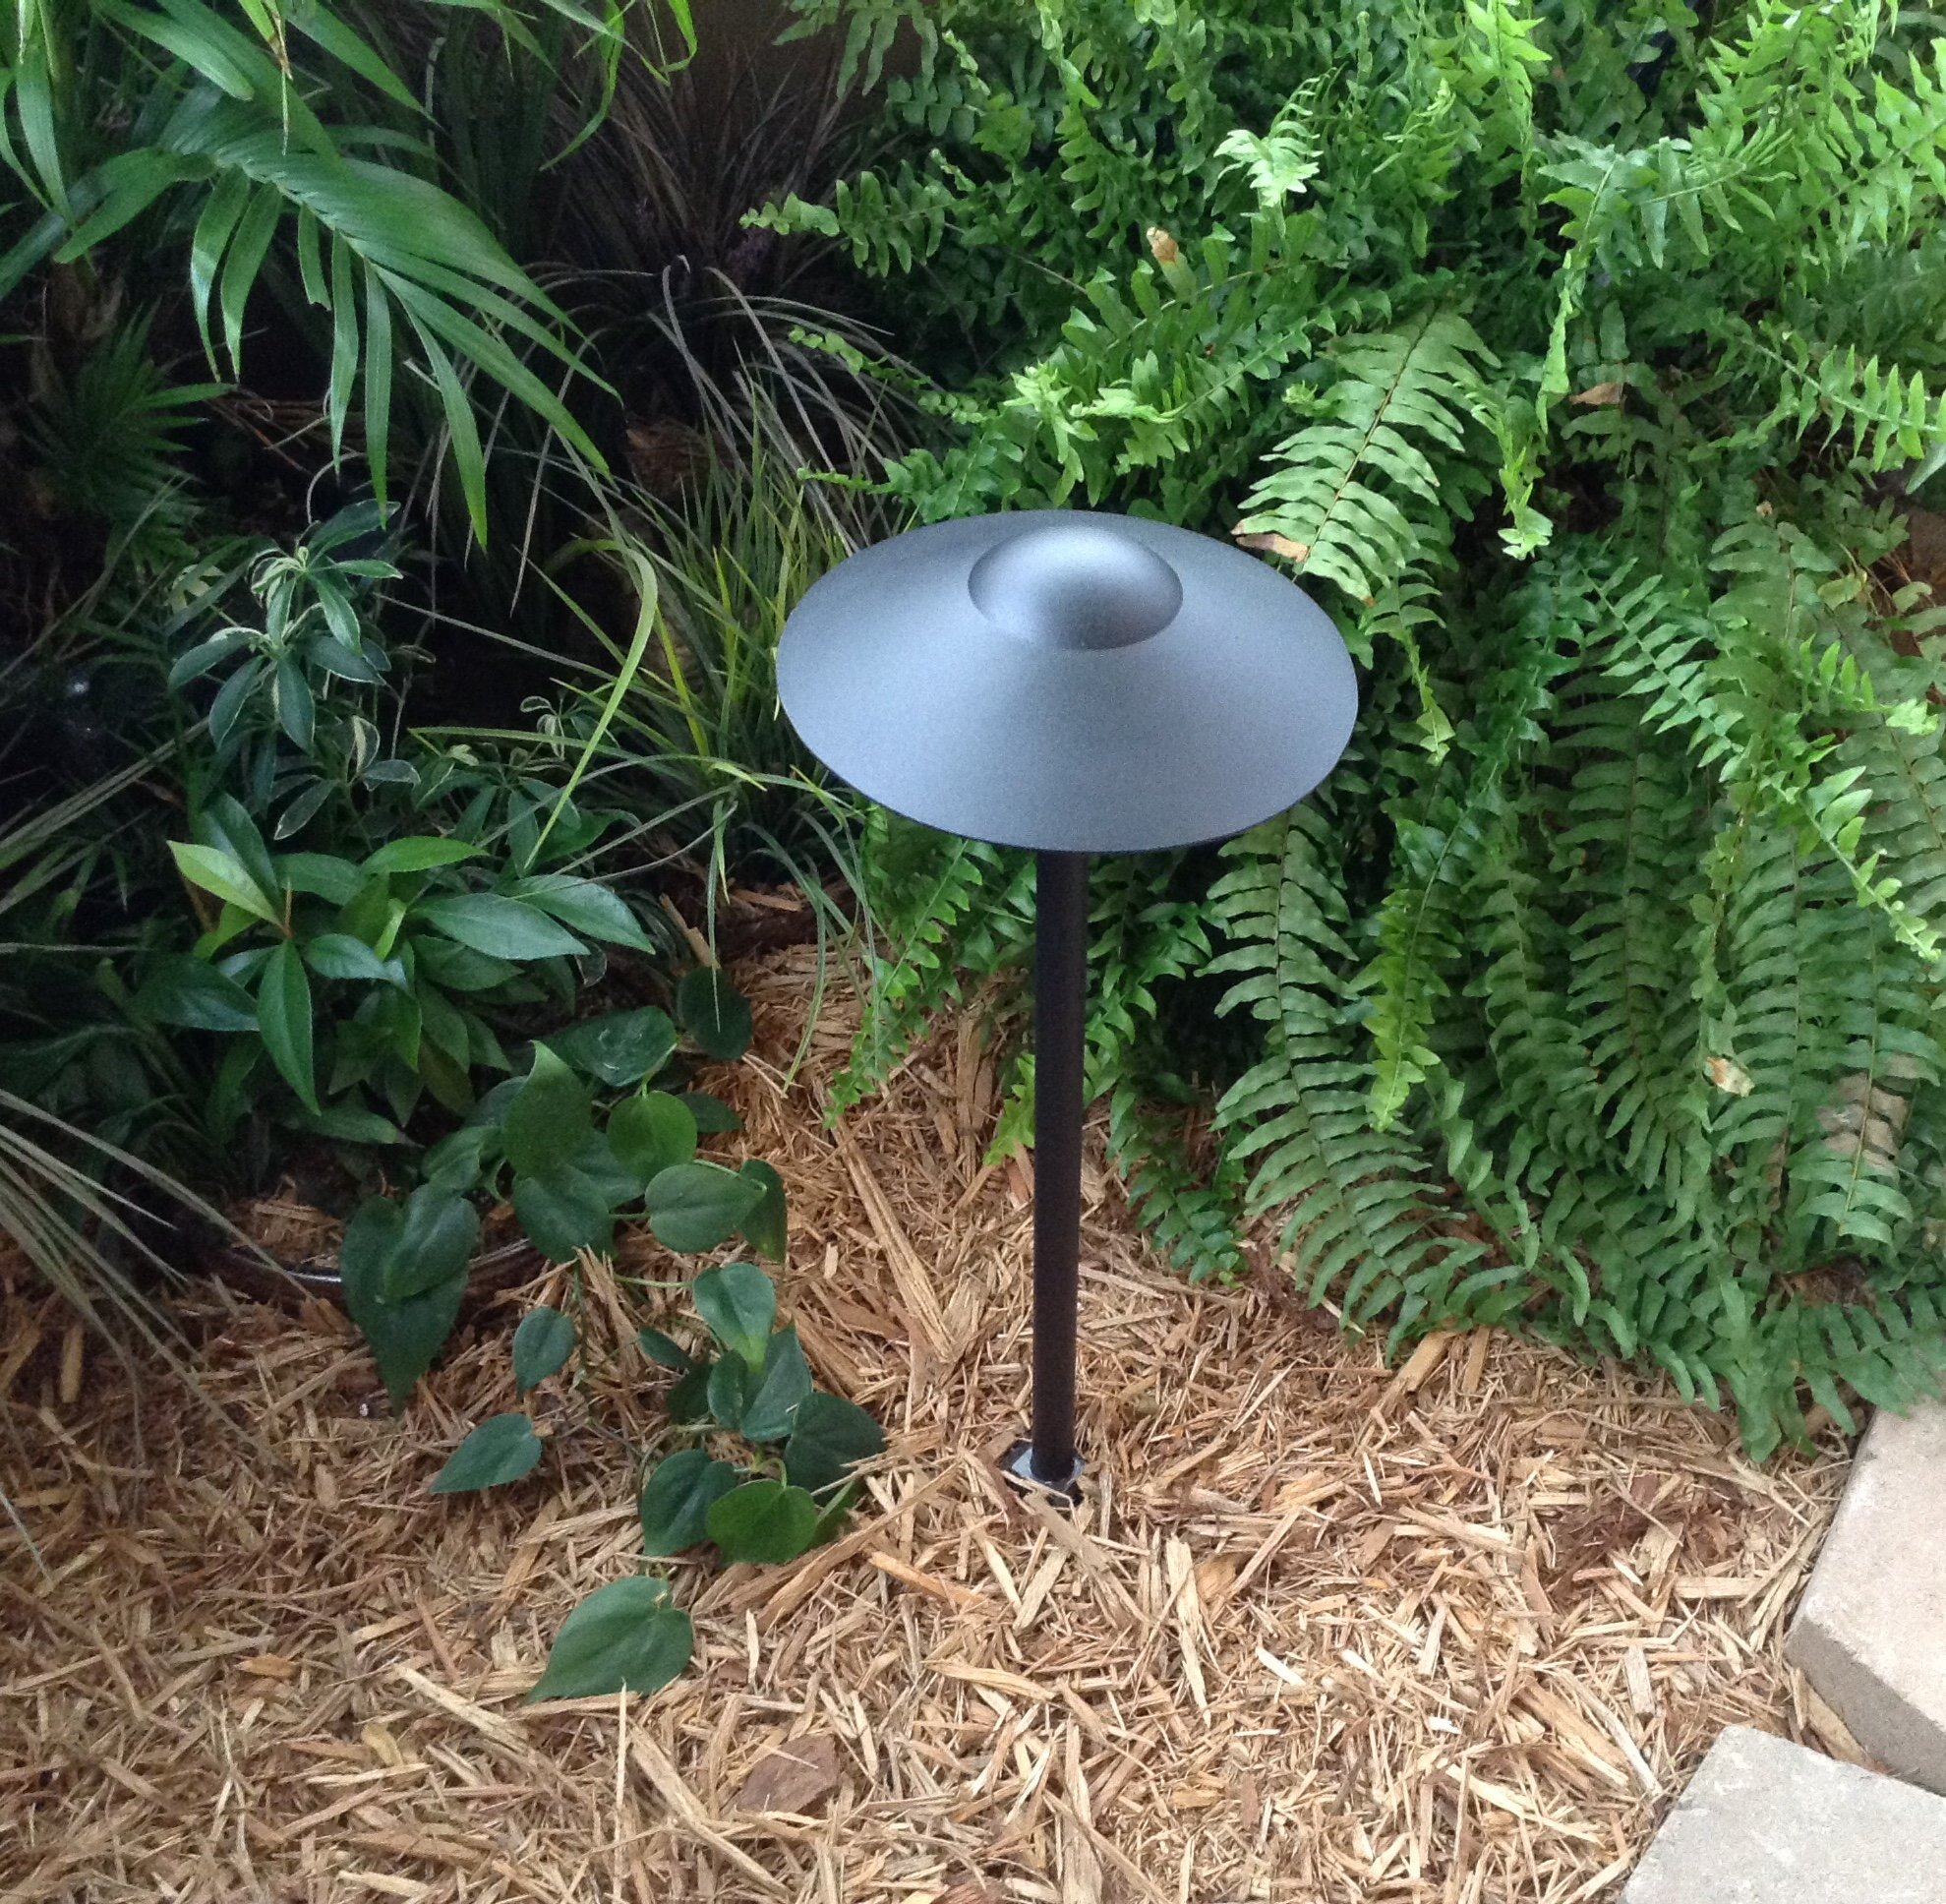 Set of 4 - LED Sagitarius Black Color Path Light By Pinnacle Lights - Low Voltage Outdoor Landscape Lighting